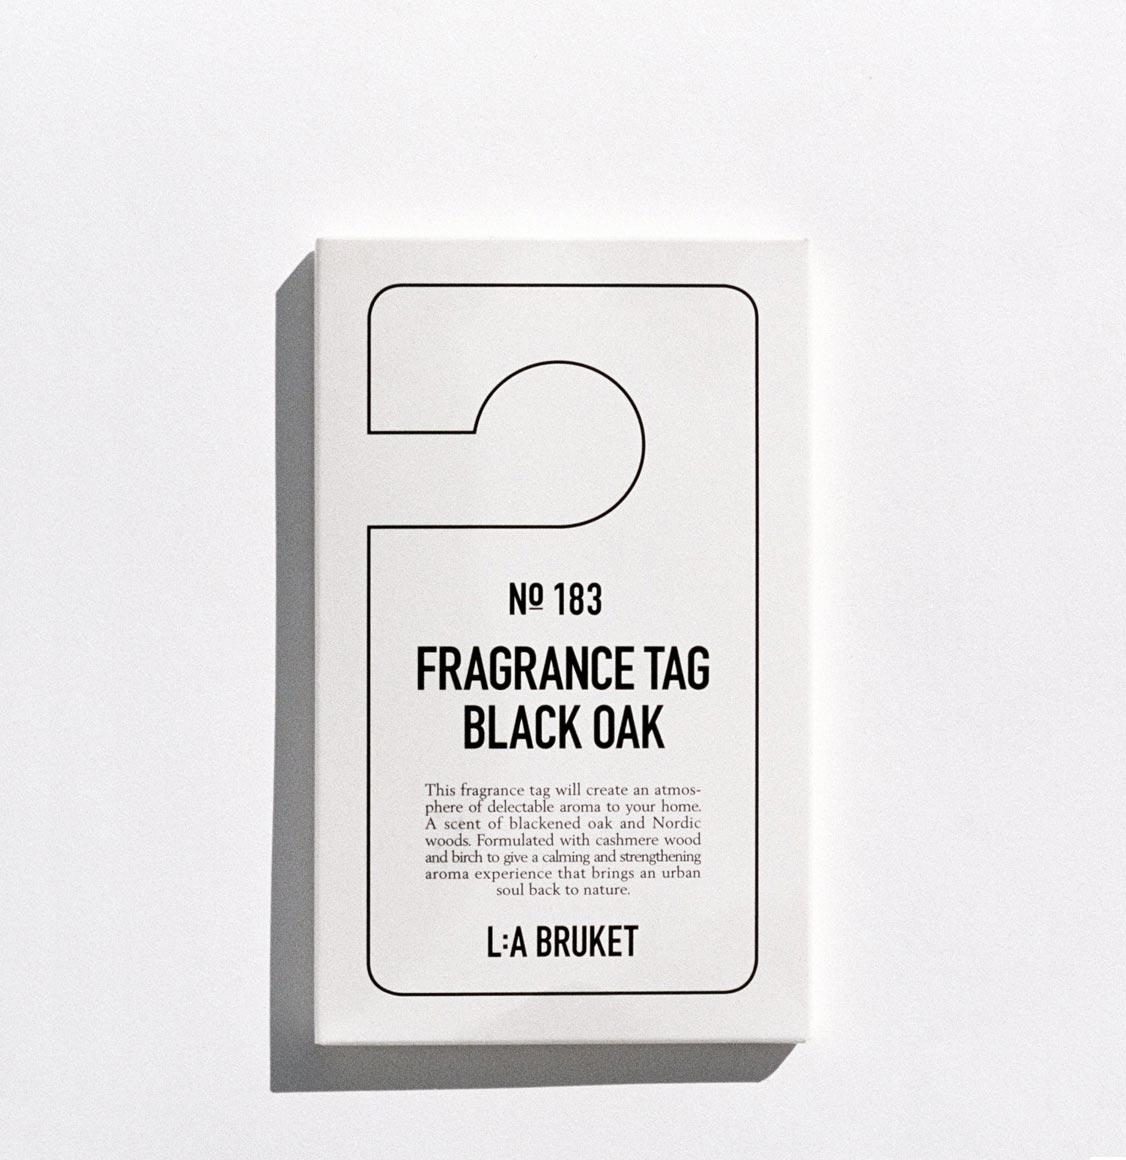 LA Bruket 183 Black Oak Scented Wardrobe Fresheners